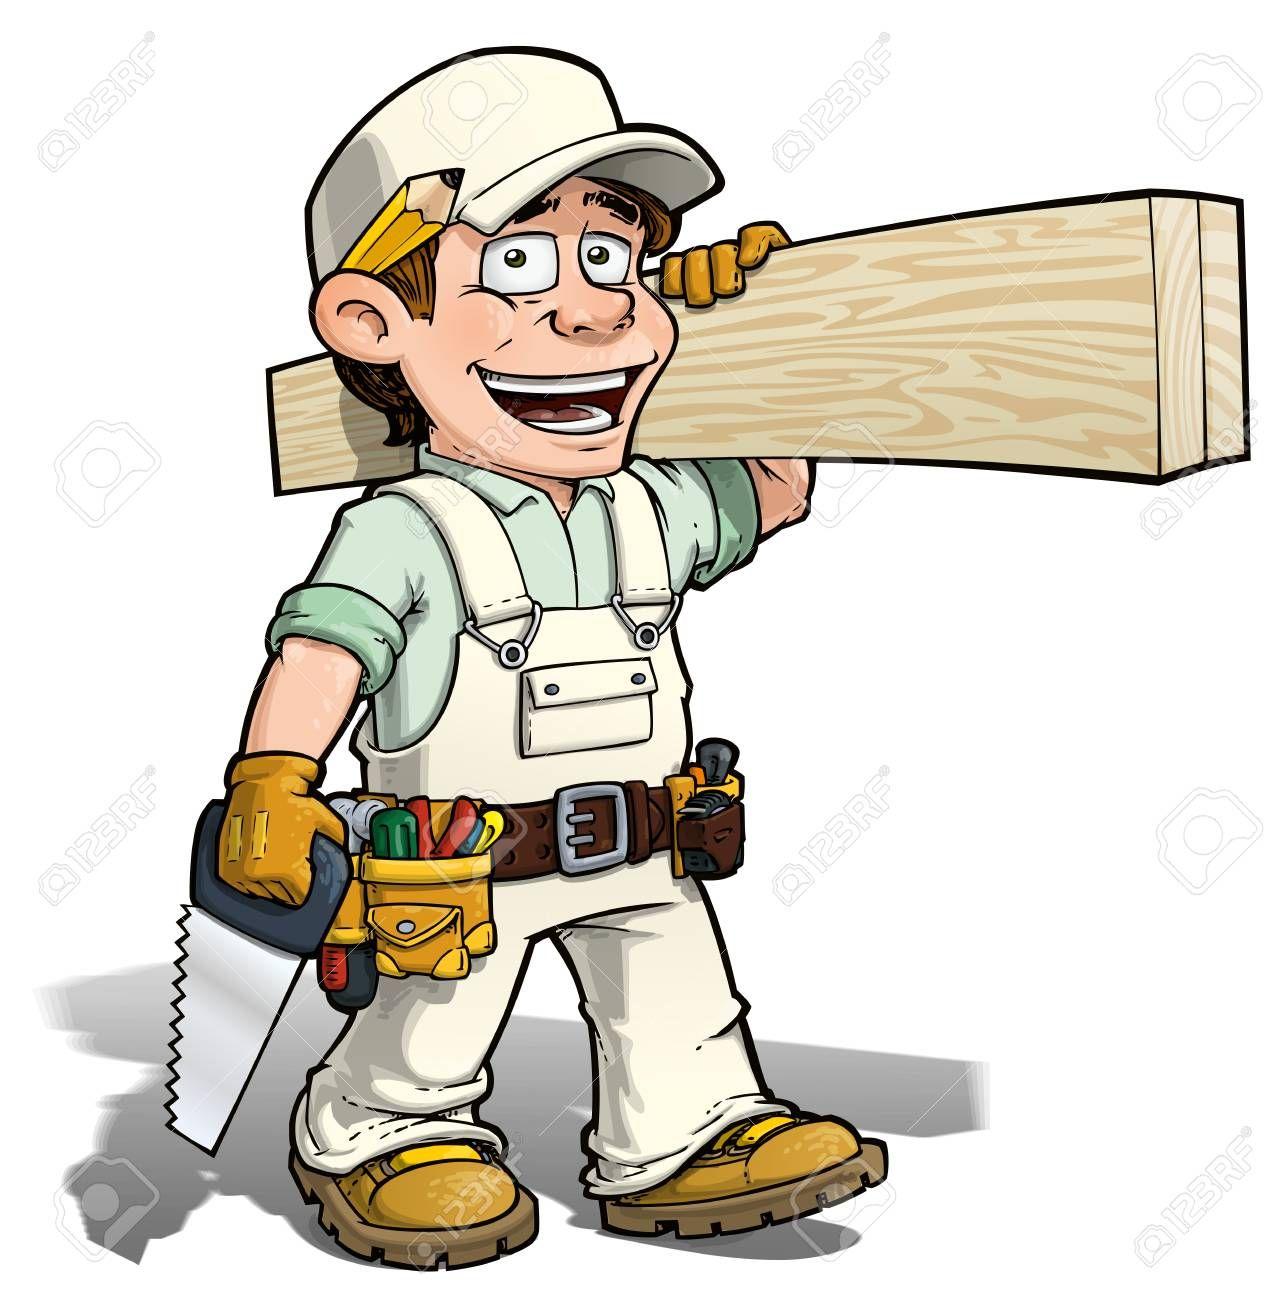 Cartoon Illustration Of A Handyman Carpenter Carrying Planks Of